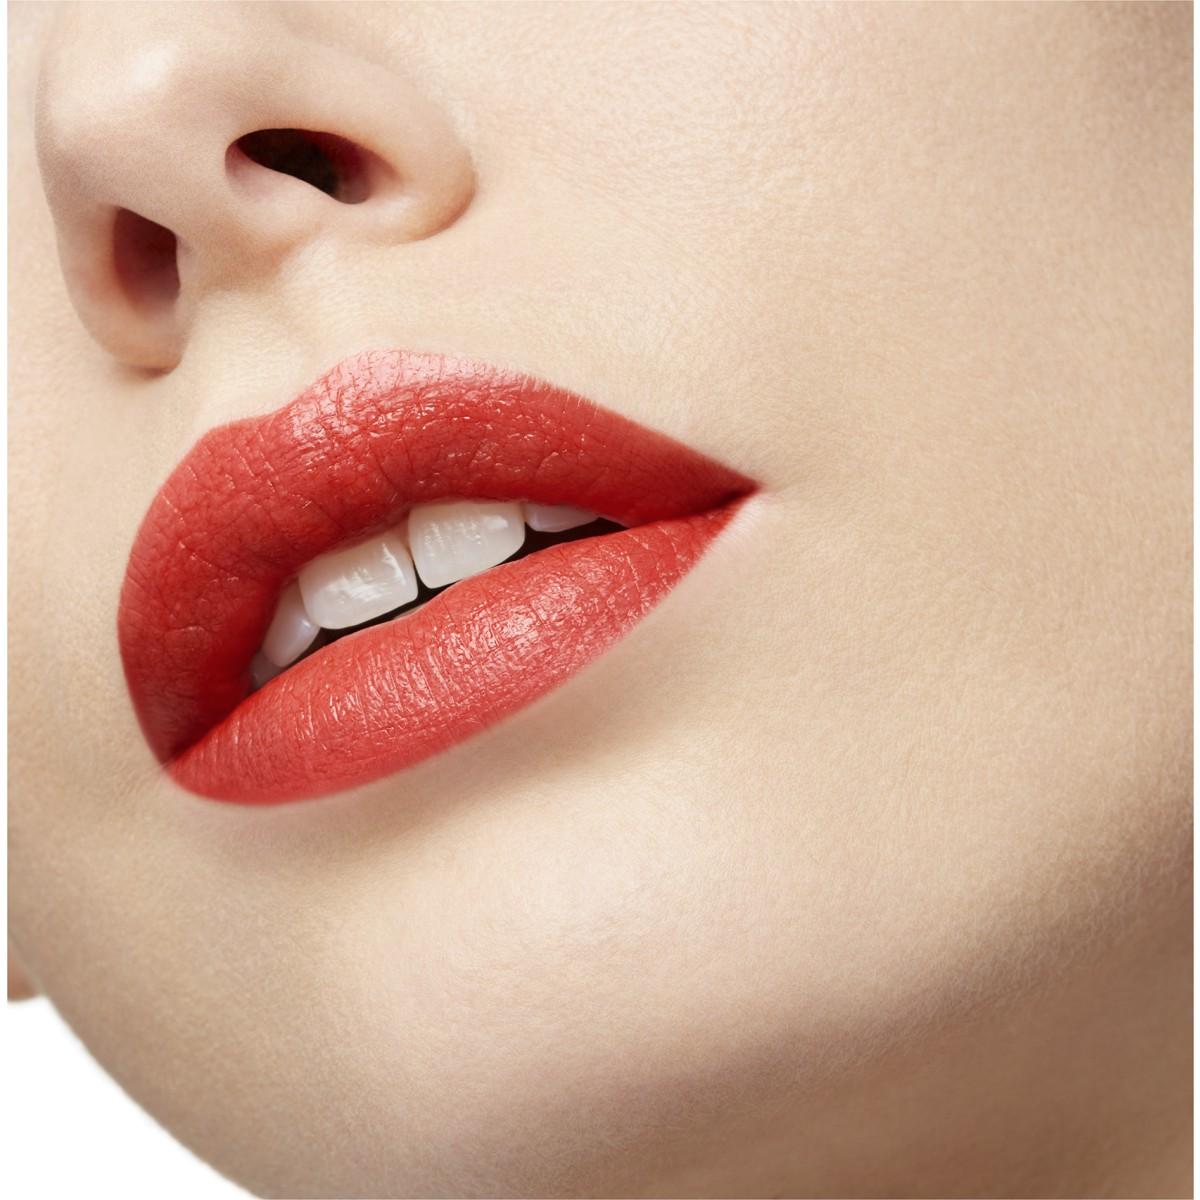 Woman Beauty - リップカラー エスカタン 605s - Christian Louboutin